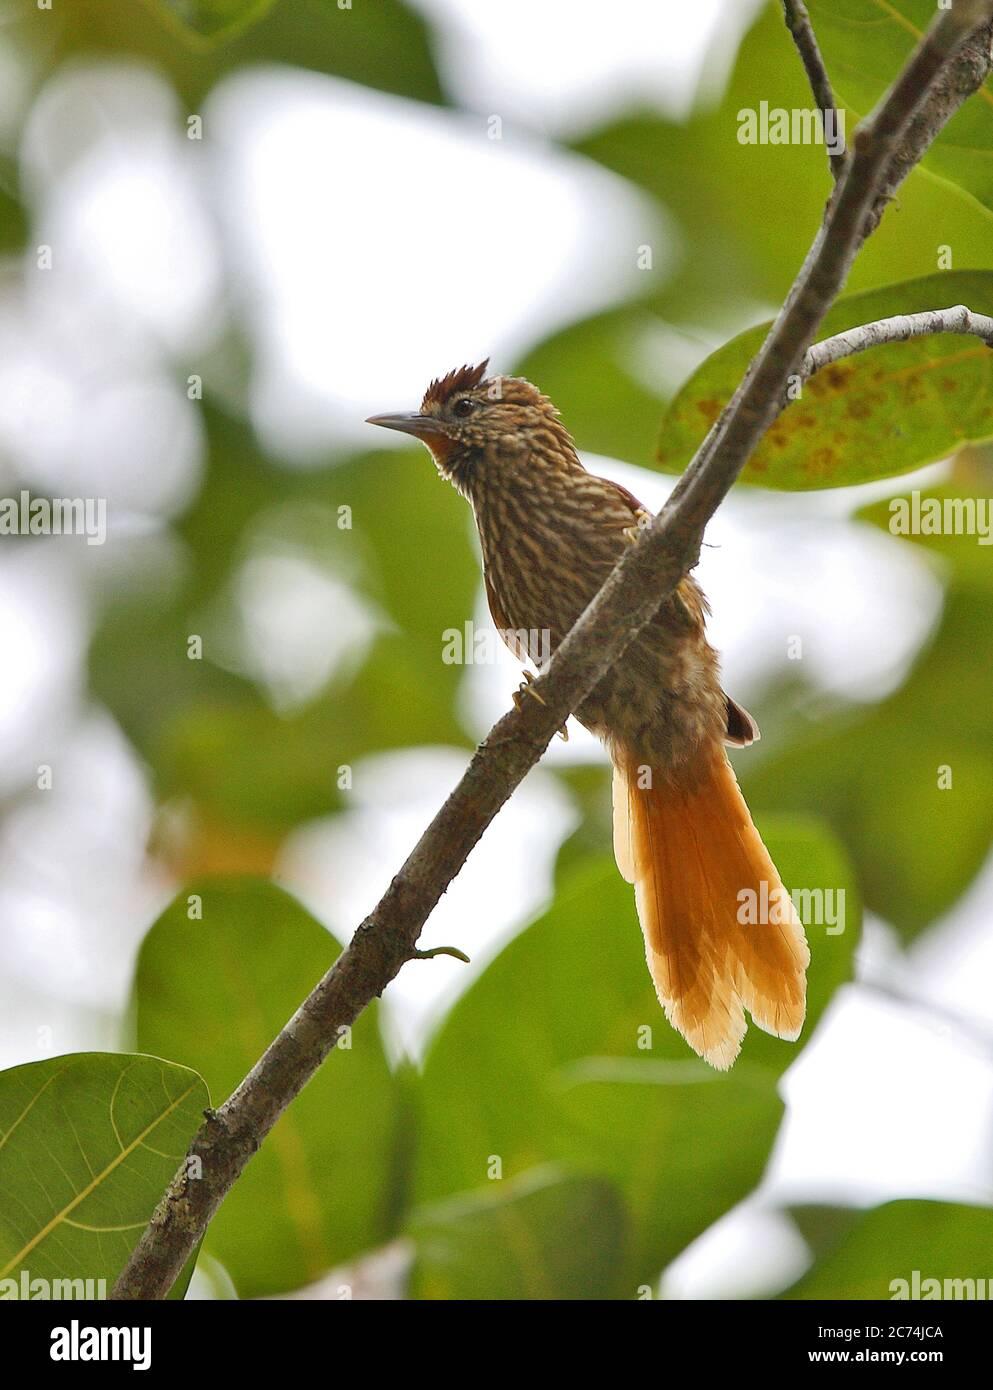 striated softtail (Thripophaga macroura), perched in understory of atlantic rainforest, Brazil Stock Photo